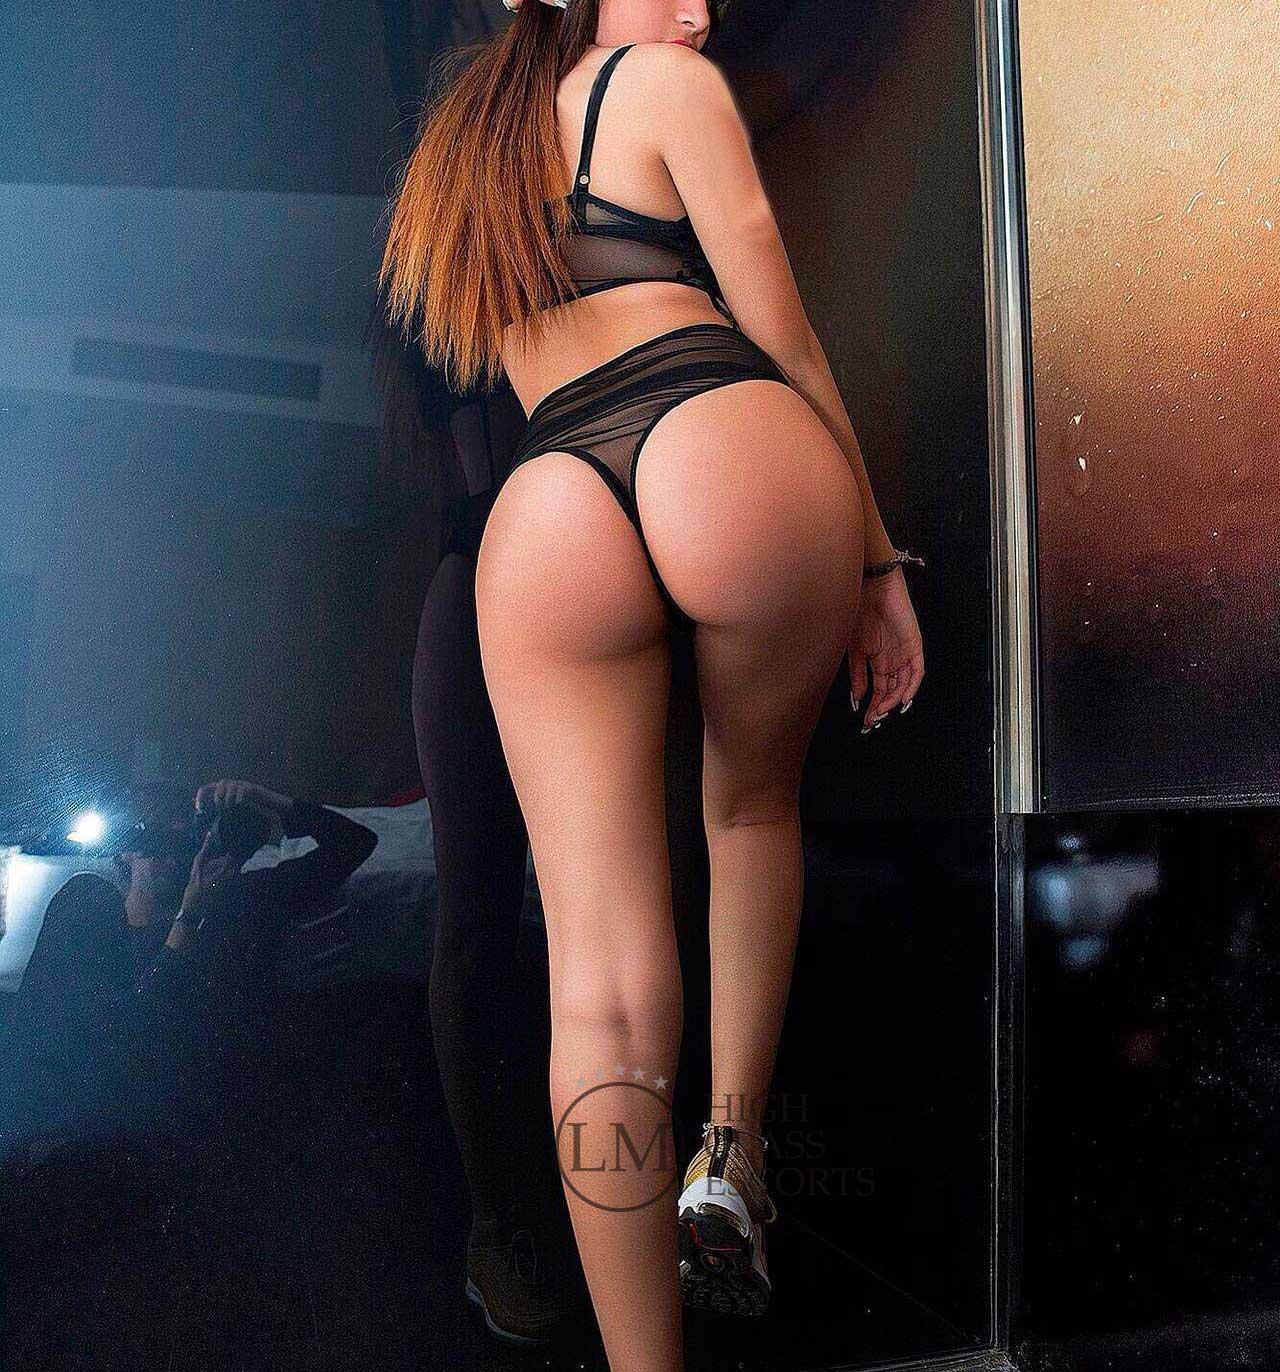 georgina_escort_madrid (4)